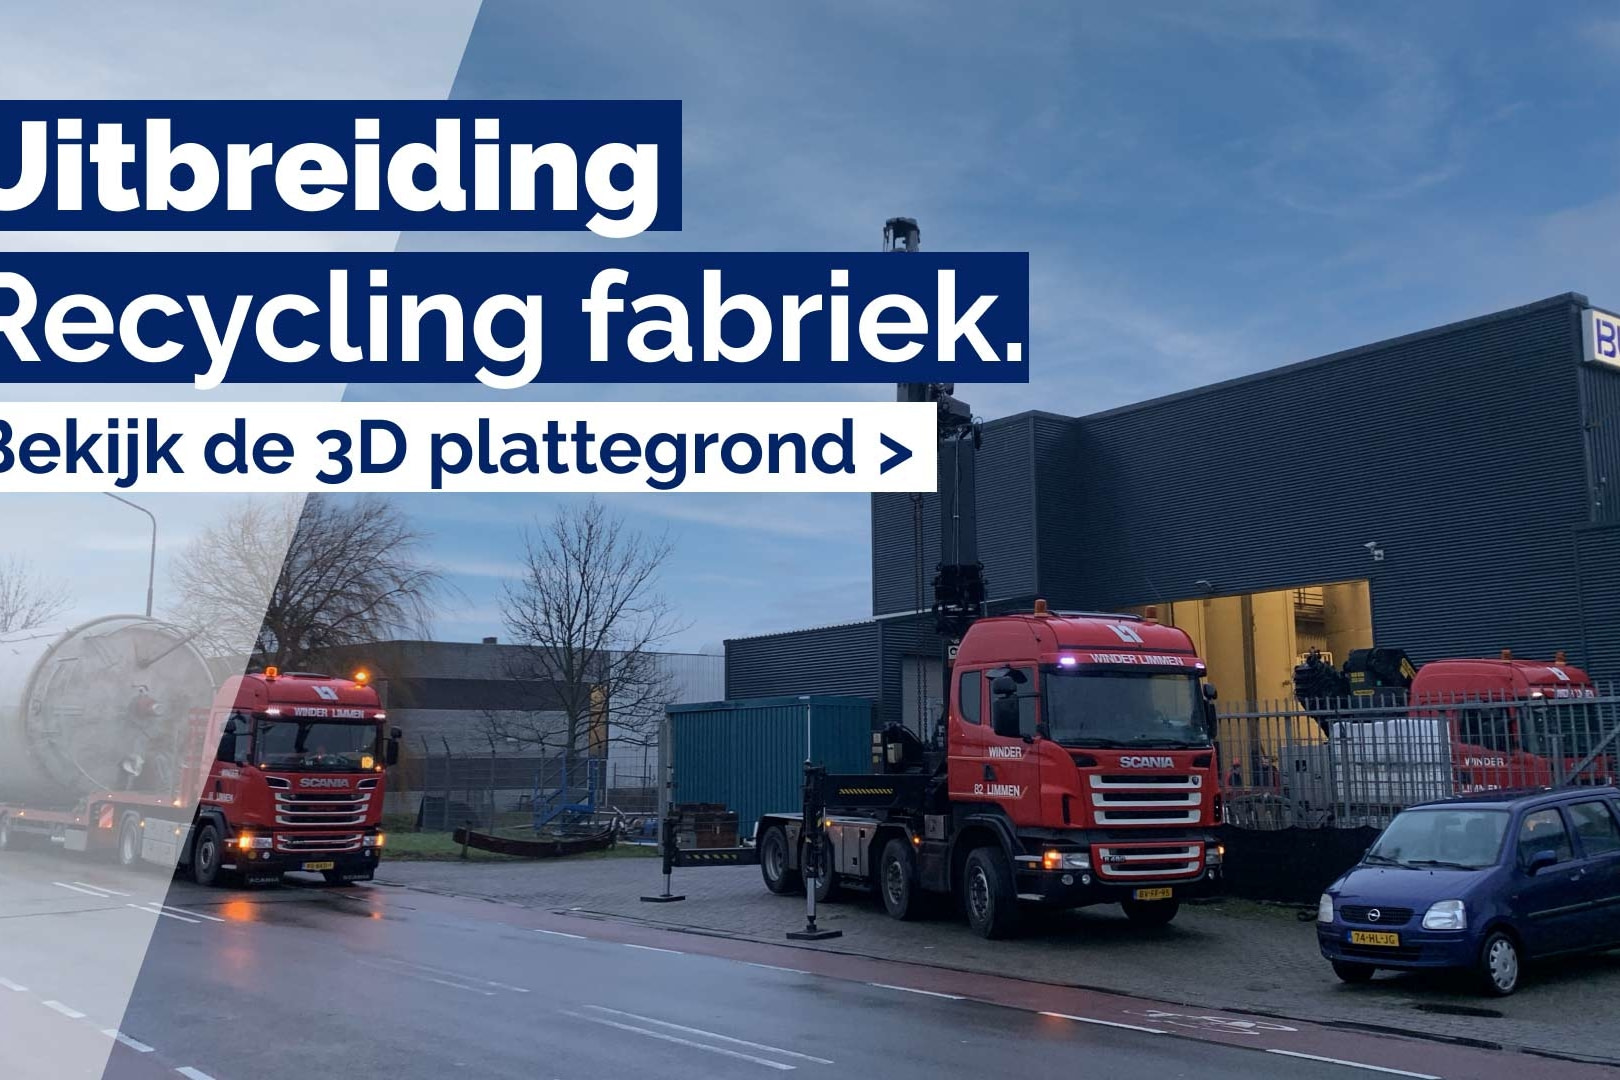 Uitbreiding recycling fabriek nieuwsartikel